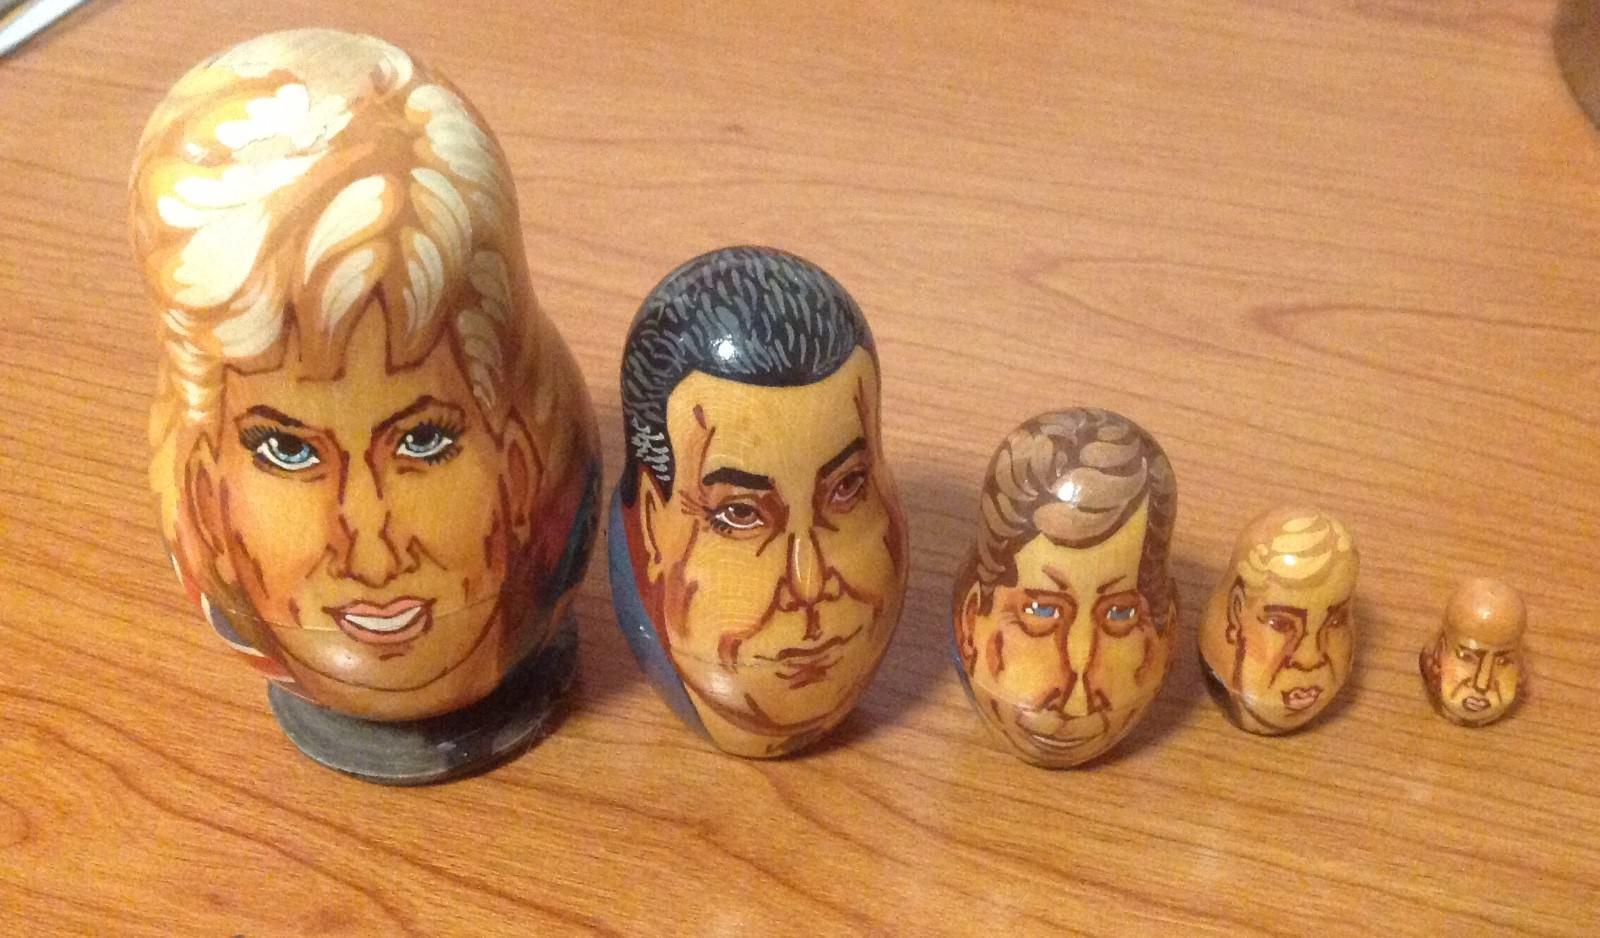 5Pcs Wooden Nesting Dolls Matryoshka Babushka Prince Charles Princess Diana